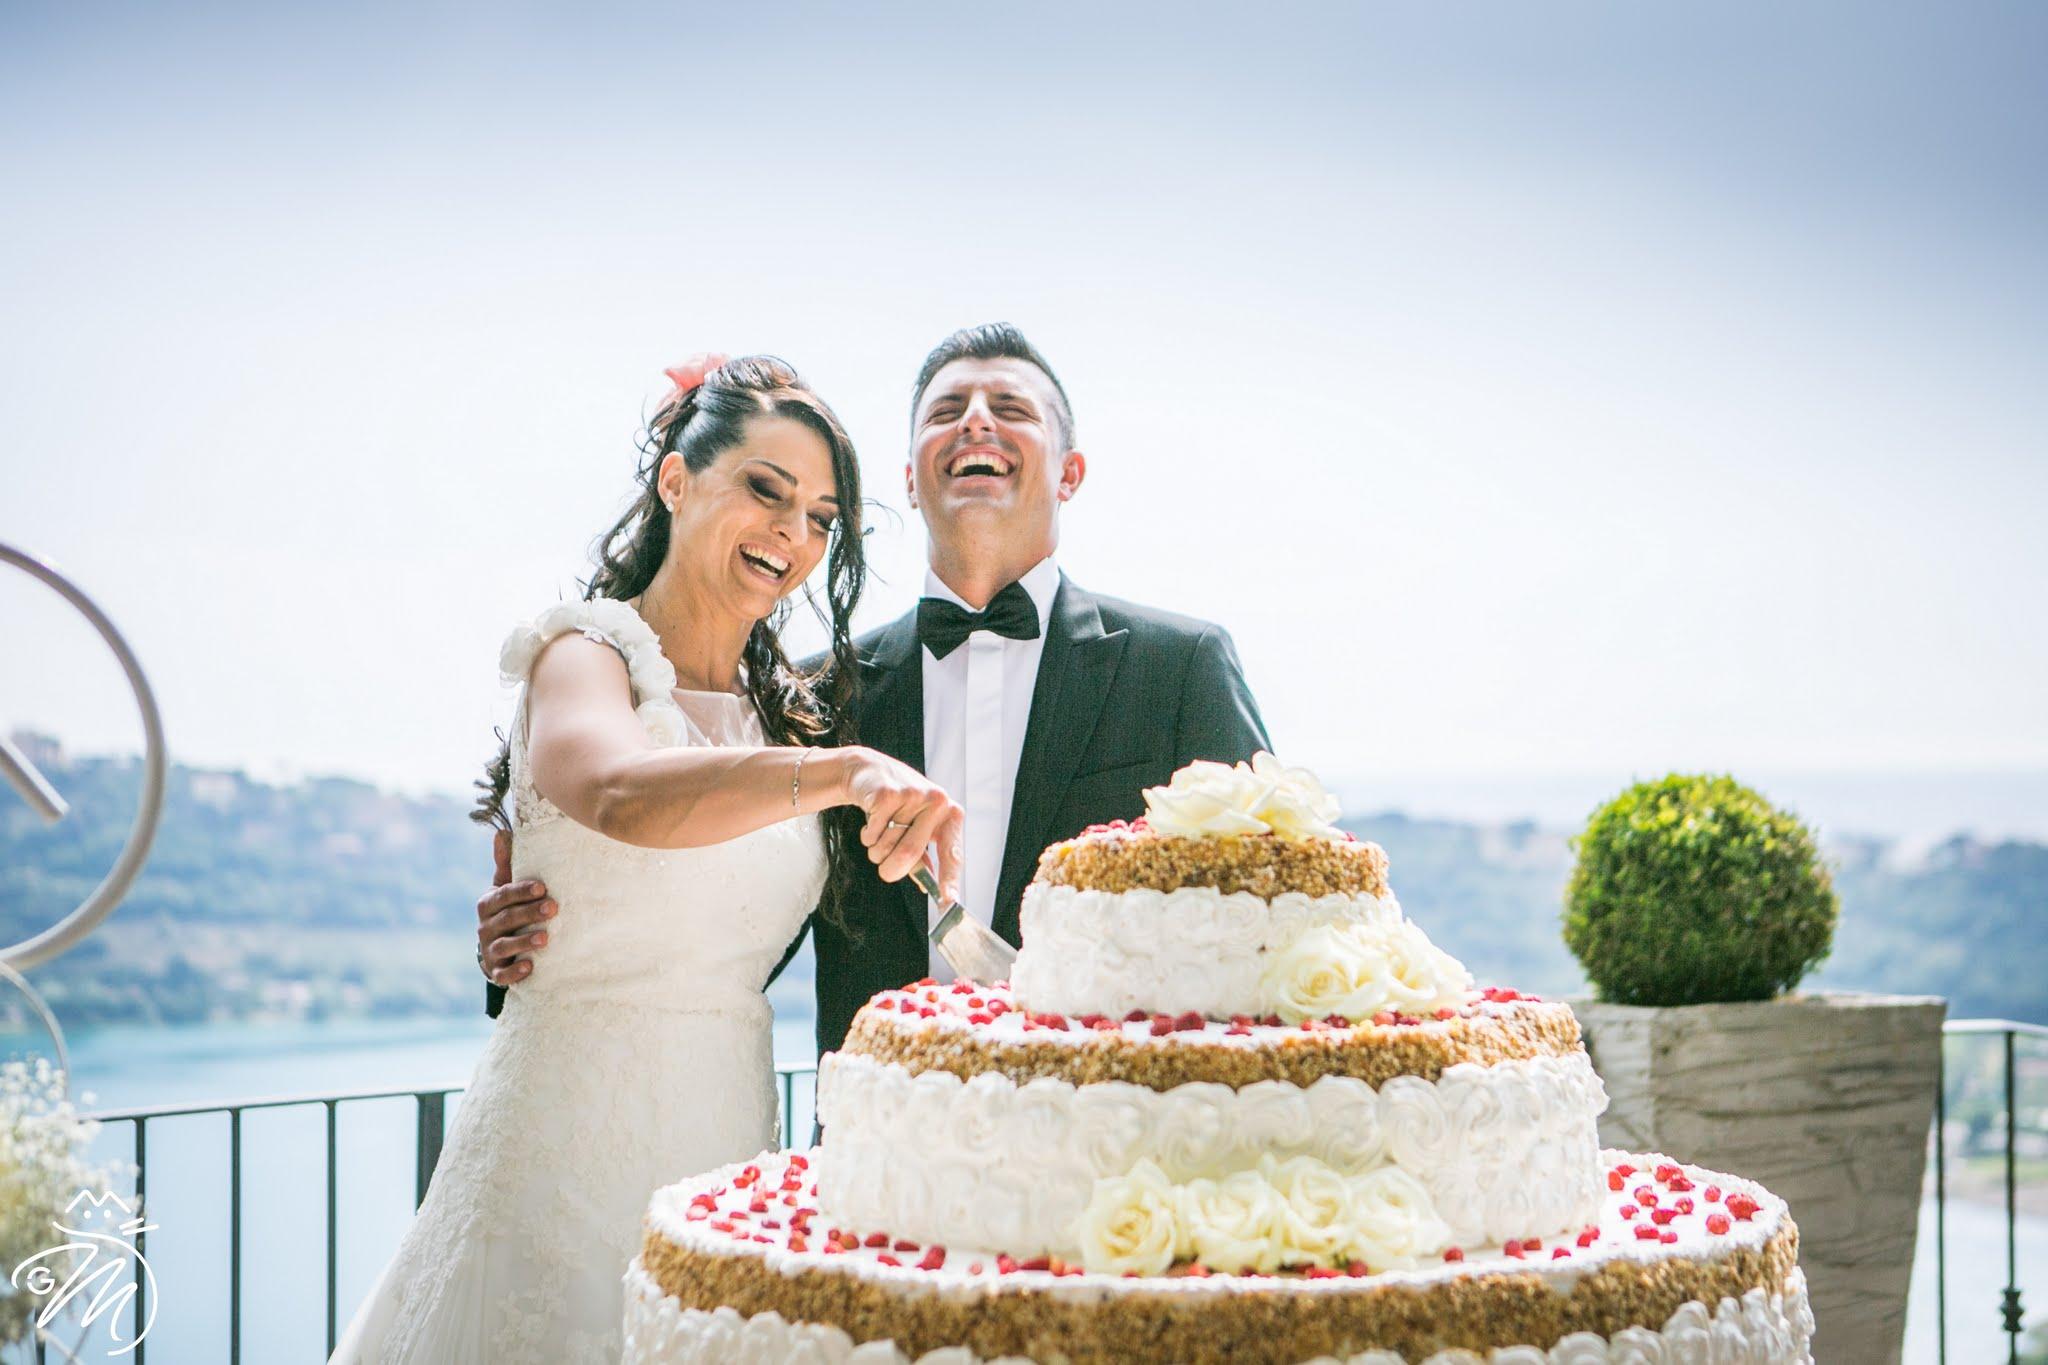 fotografo matrimonio Roma photographer in Italy ORIZZONTALI2_LOGO_HOME_PAGE_INTERNATIONAL_PHOTOGRAPHER_IN_ROME_WEDDING_DESTINATION_GIROLAMO_MONTELEONE_-28